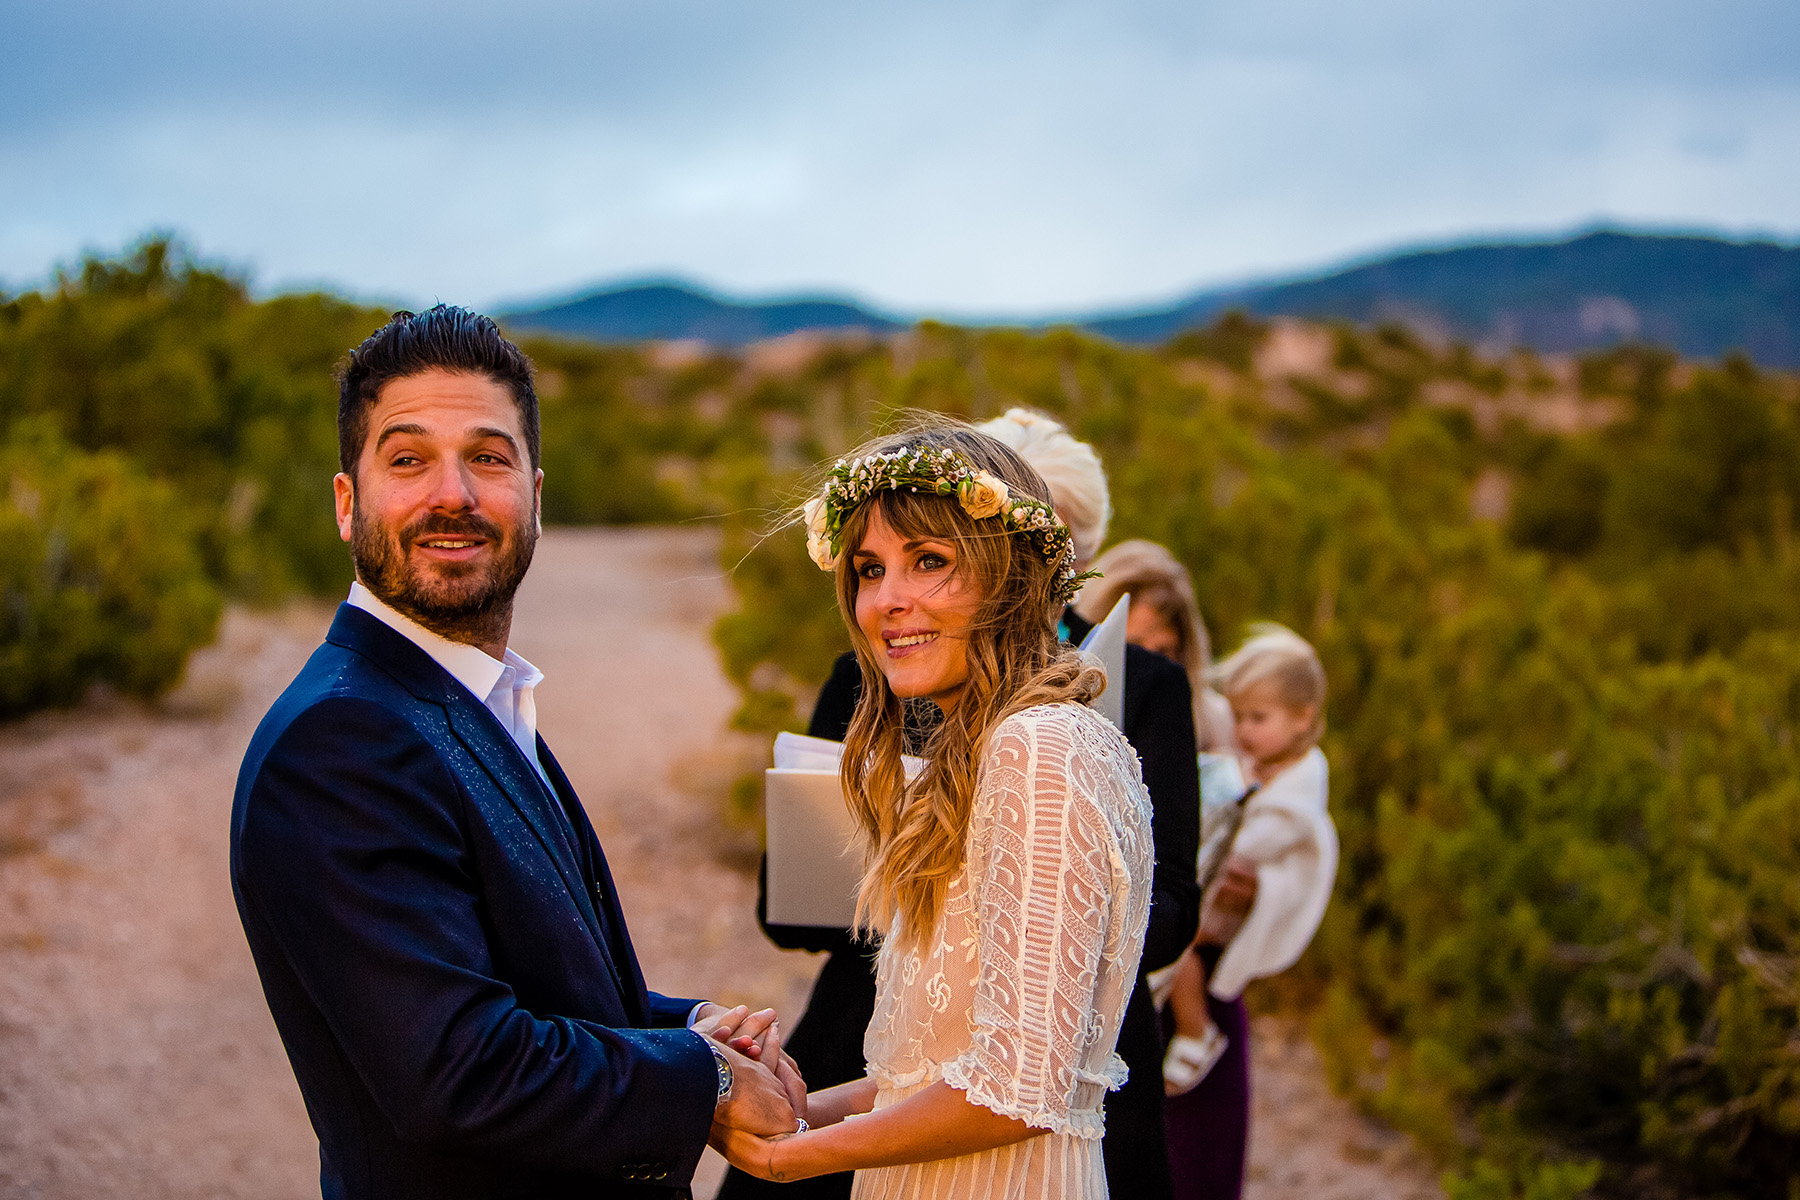 Melinda-Dustin-wedding-four-seasons-resort-santa-fe-new-mexico-1020